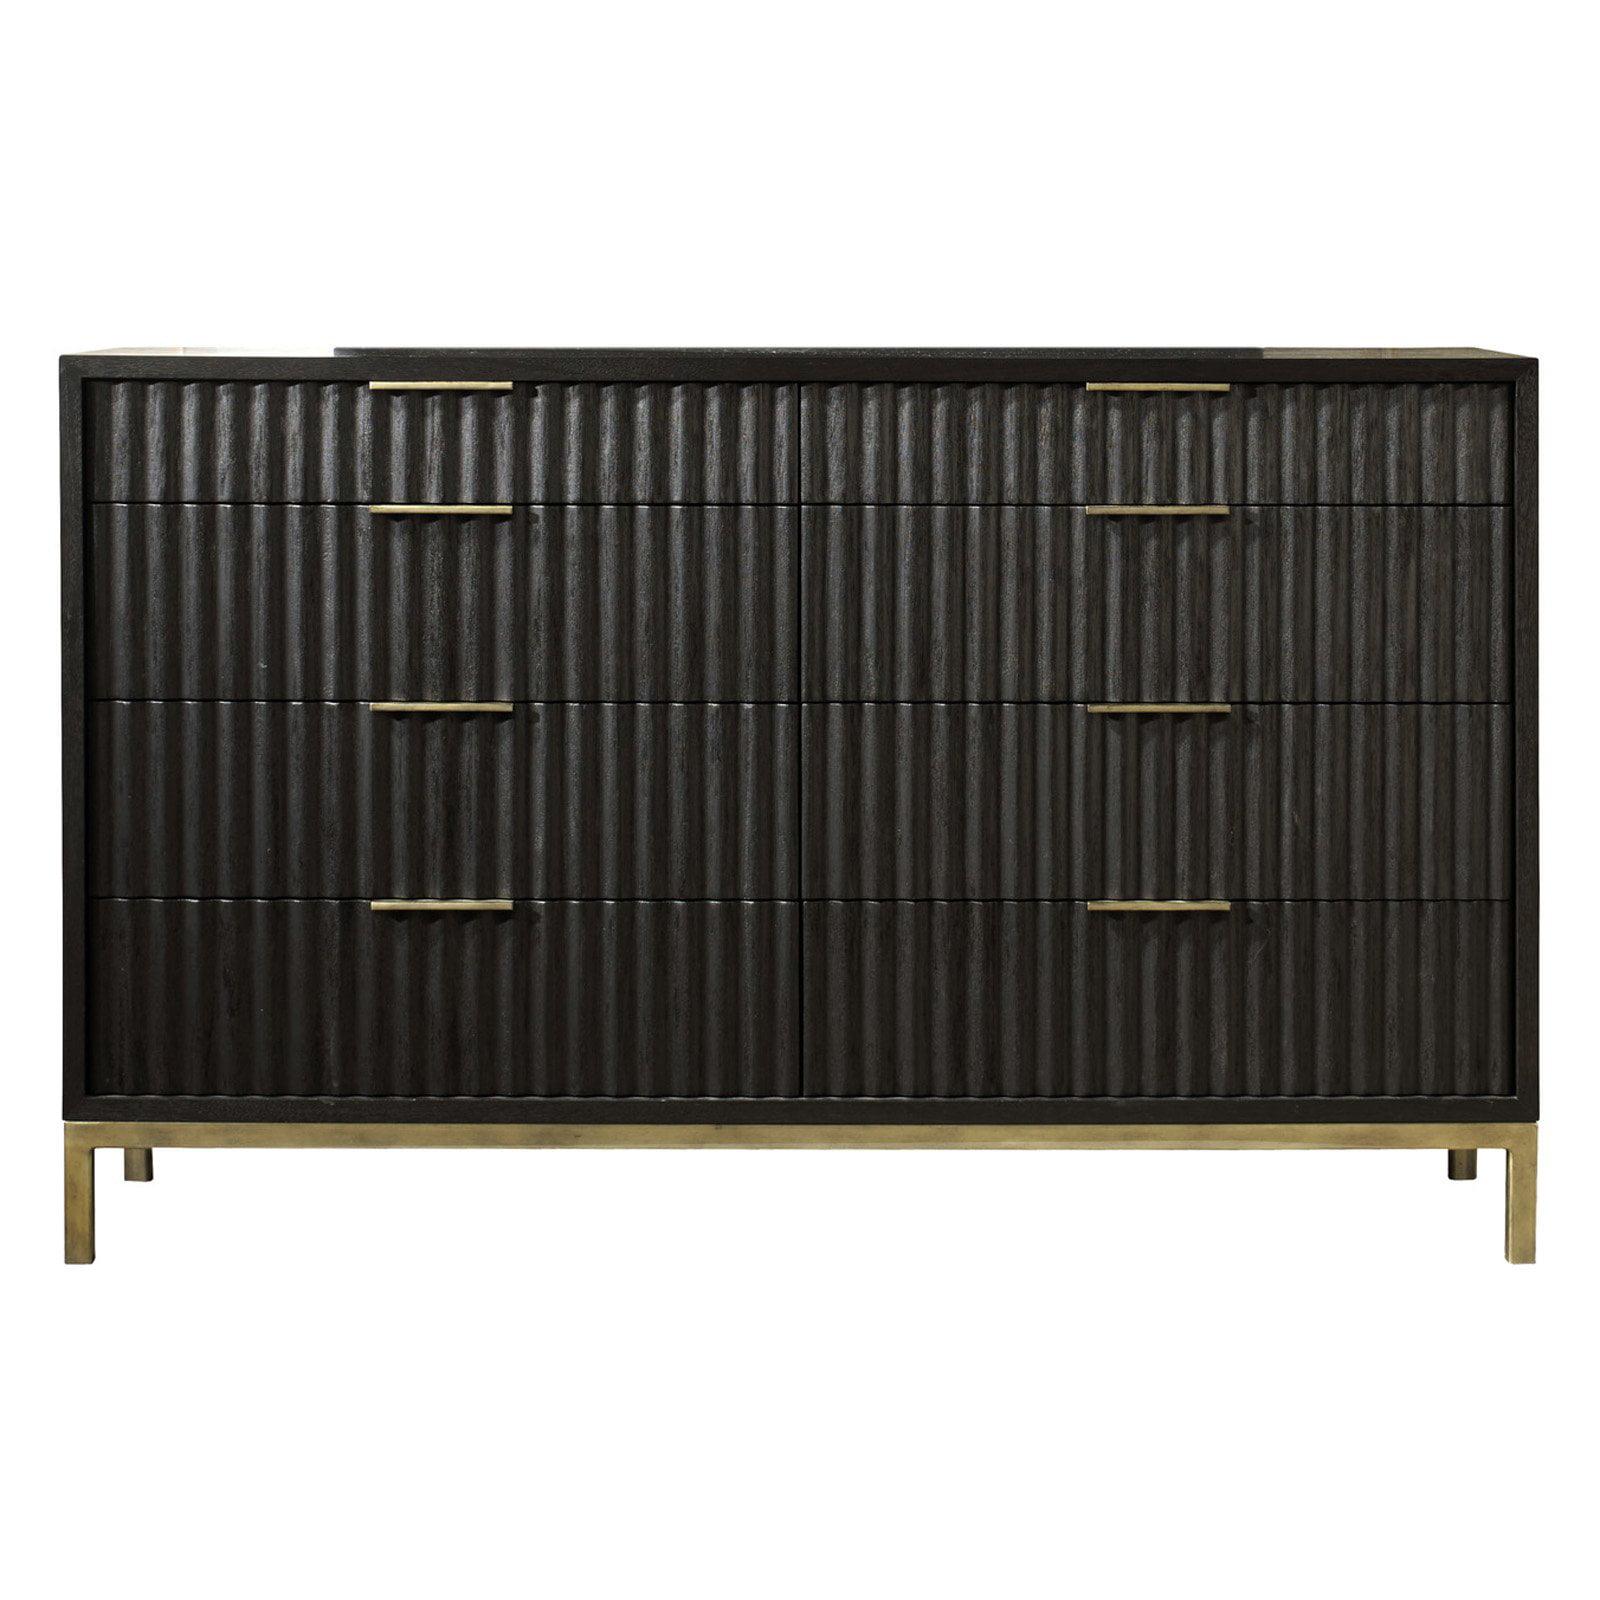 Modus Kentfield 8-Drawer Dresser with Optional Mirror by Modus Furniture